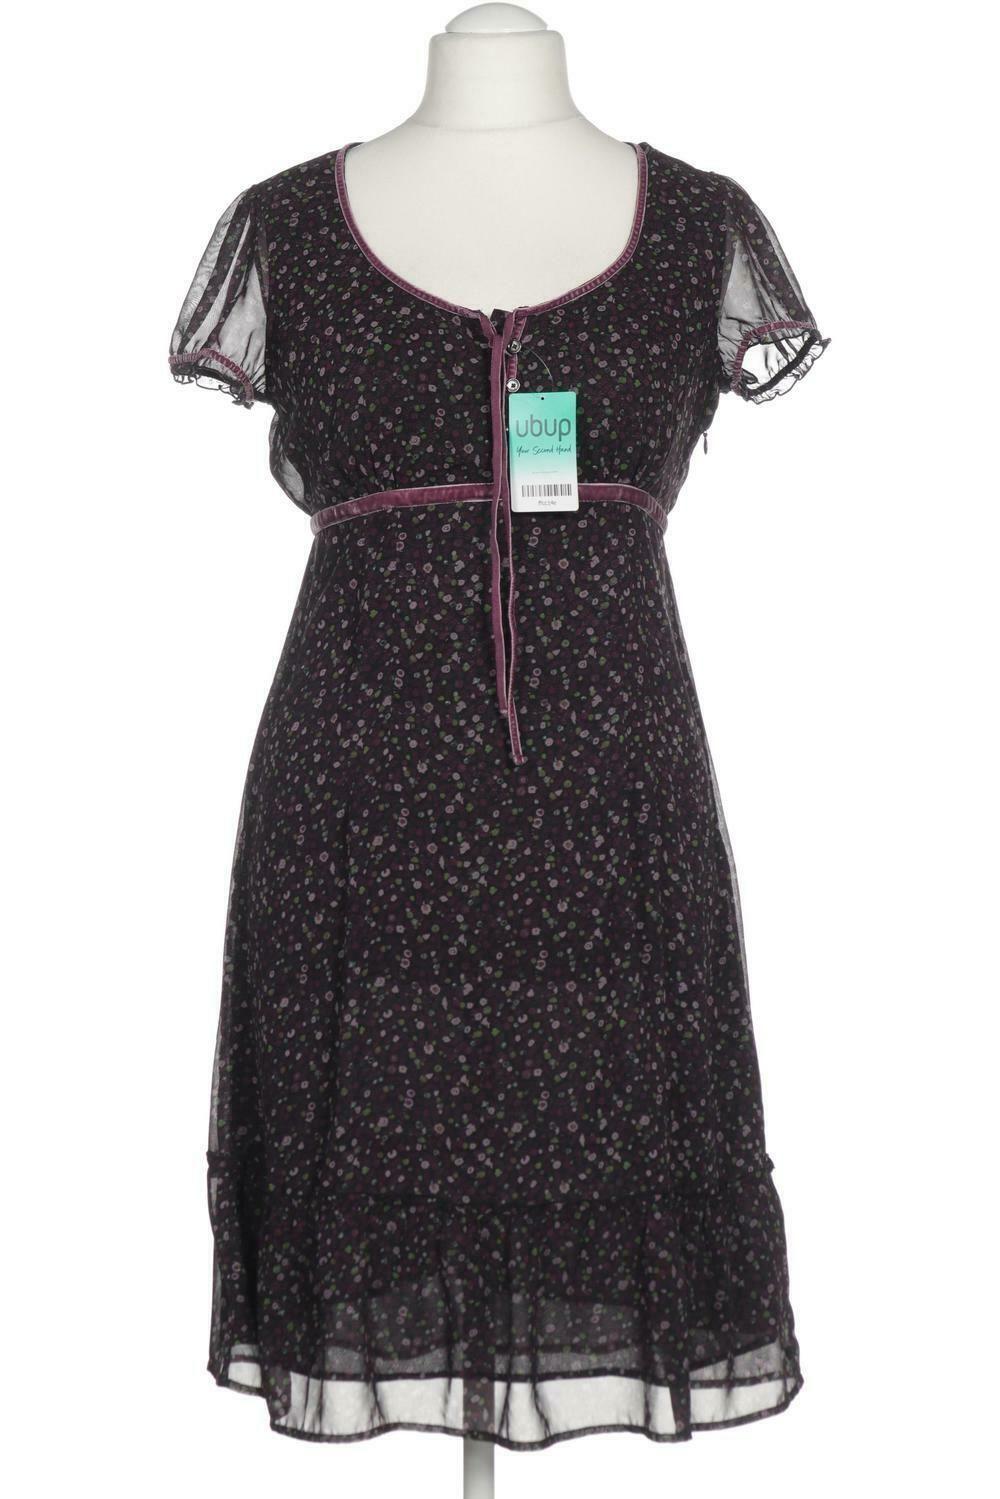 Esprit Kleid Damen Dress Damenkleid Gr. DE 16 lila #ffcc16e